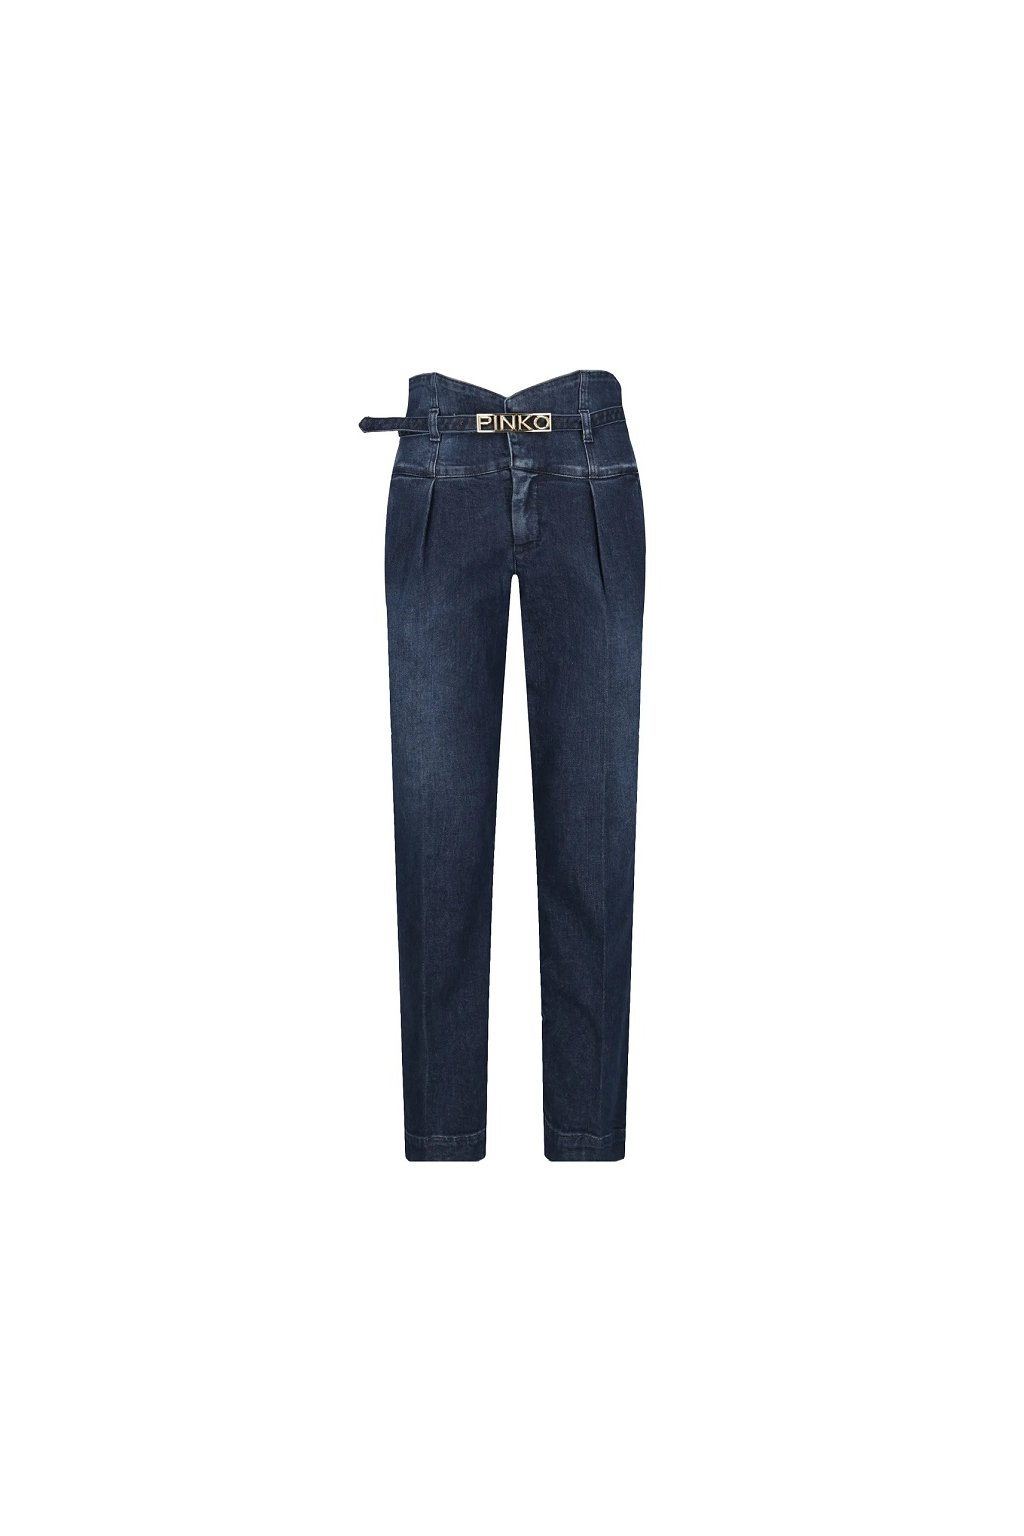 1J10GN Y62QDámské džíny Pinko Ariel 3 modré